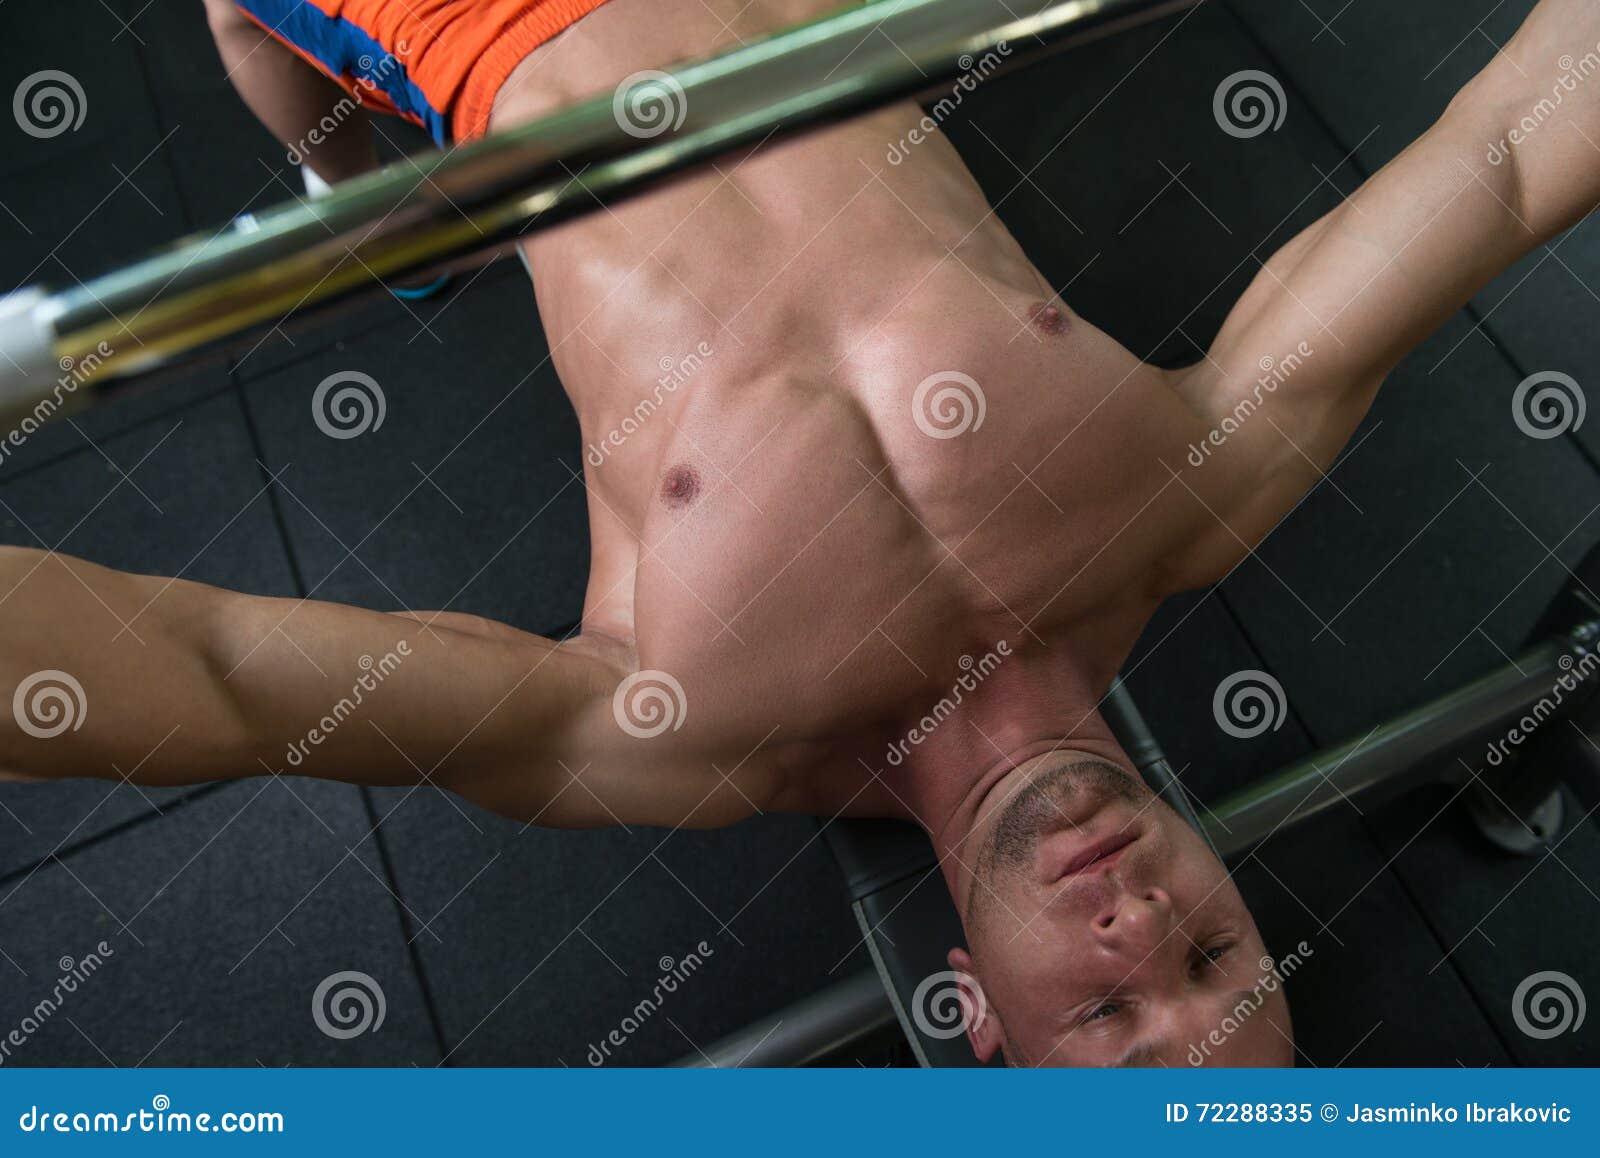 Download Конец разминки жима лёжа вверх Стоковое Изображение - изображение насчитывающей возмужало, bodysuits: 72288335